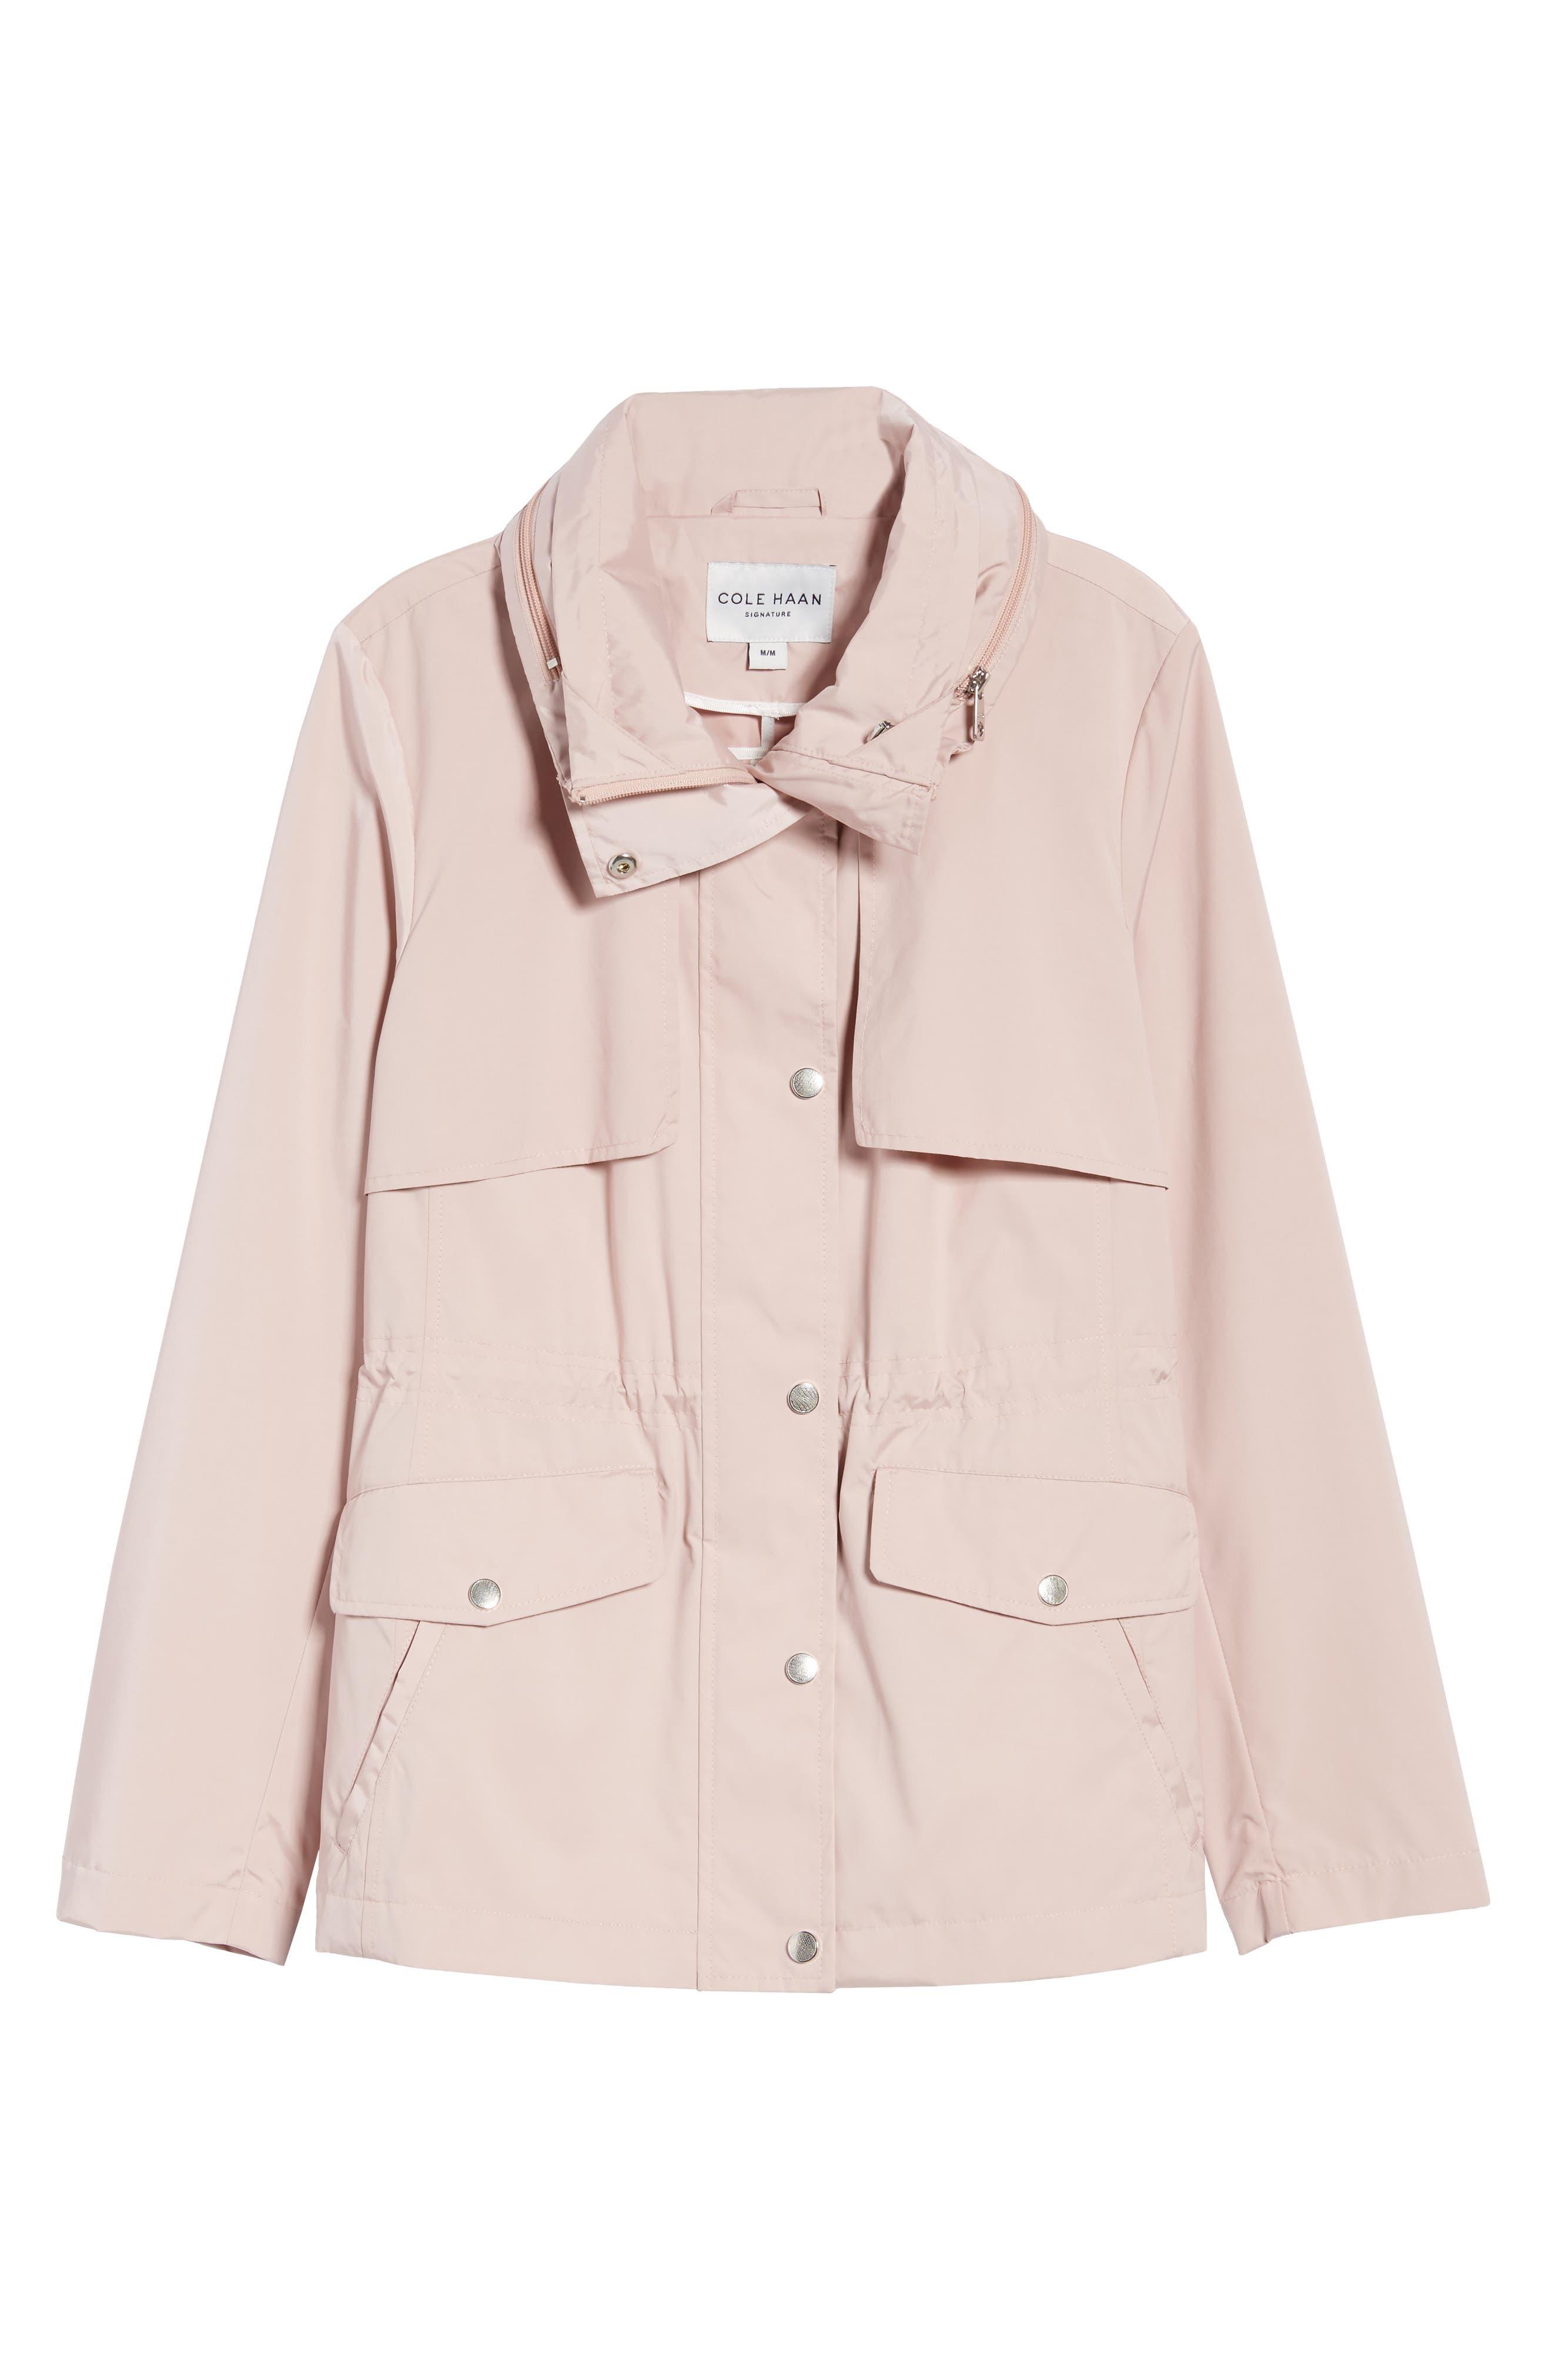 Cole Haan Signature Packable Raincoat